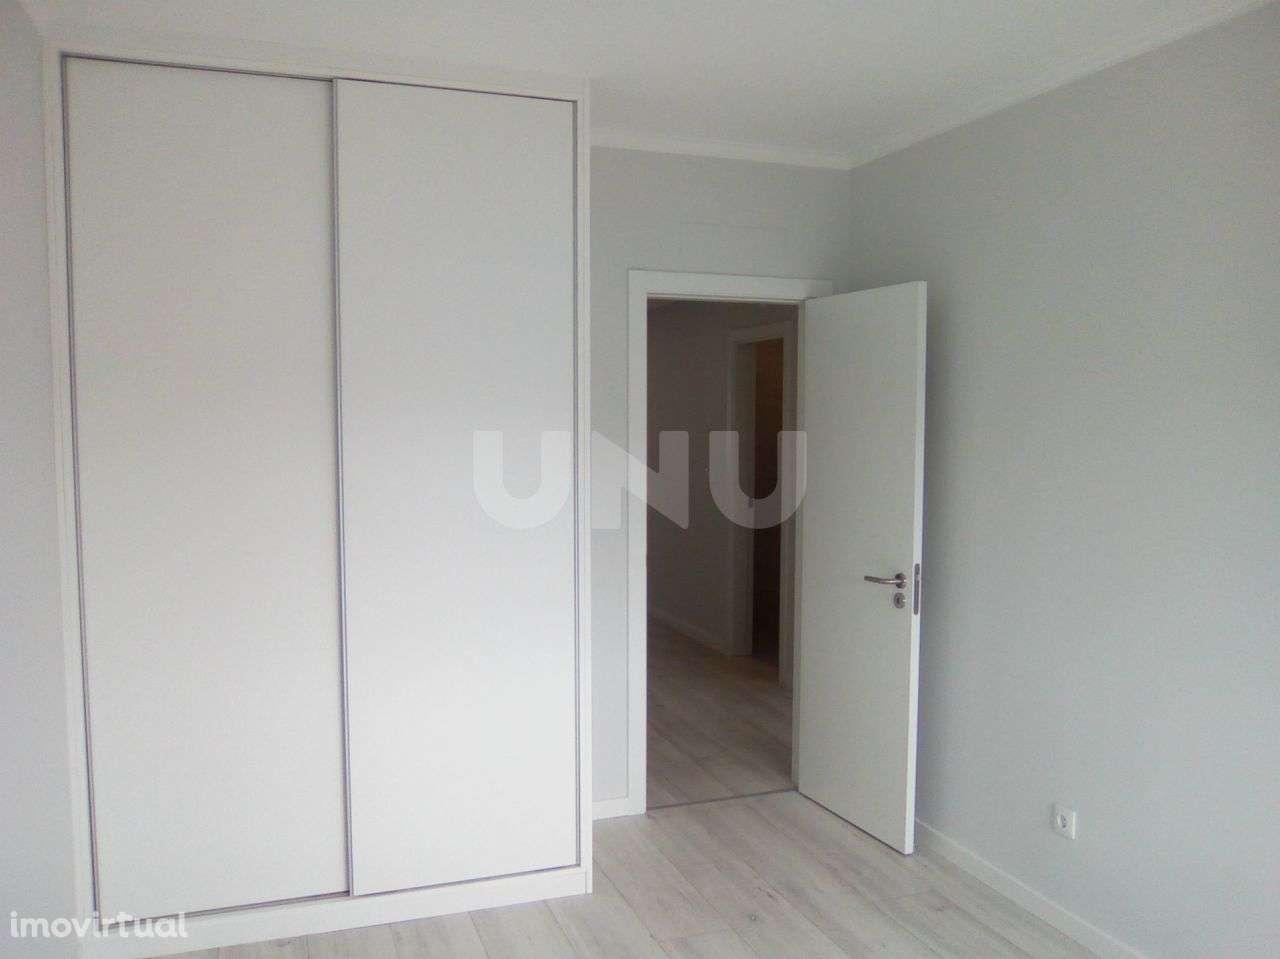 Apartamento para comprar, Barcarena, Lisboa - Foto 8